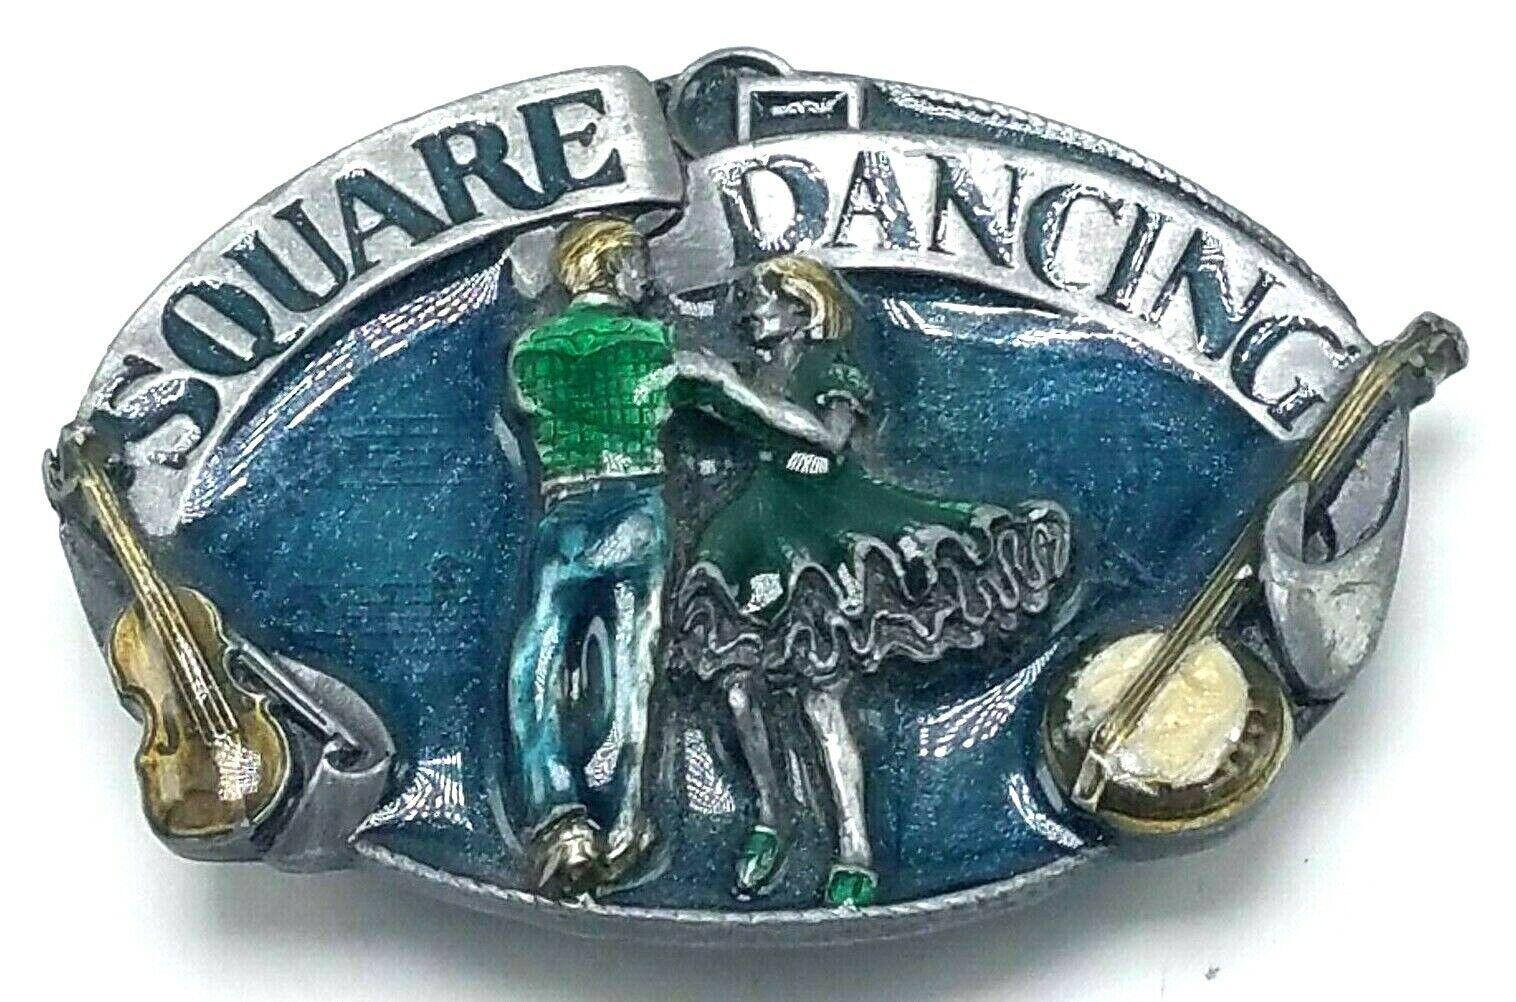 1985 Siskiyou Gürtelschnalle Zinn & Emaille Quadrat Tanzende Tänzer Banjo EUC